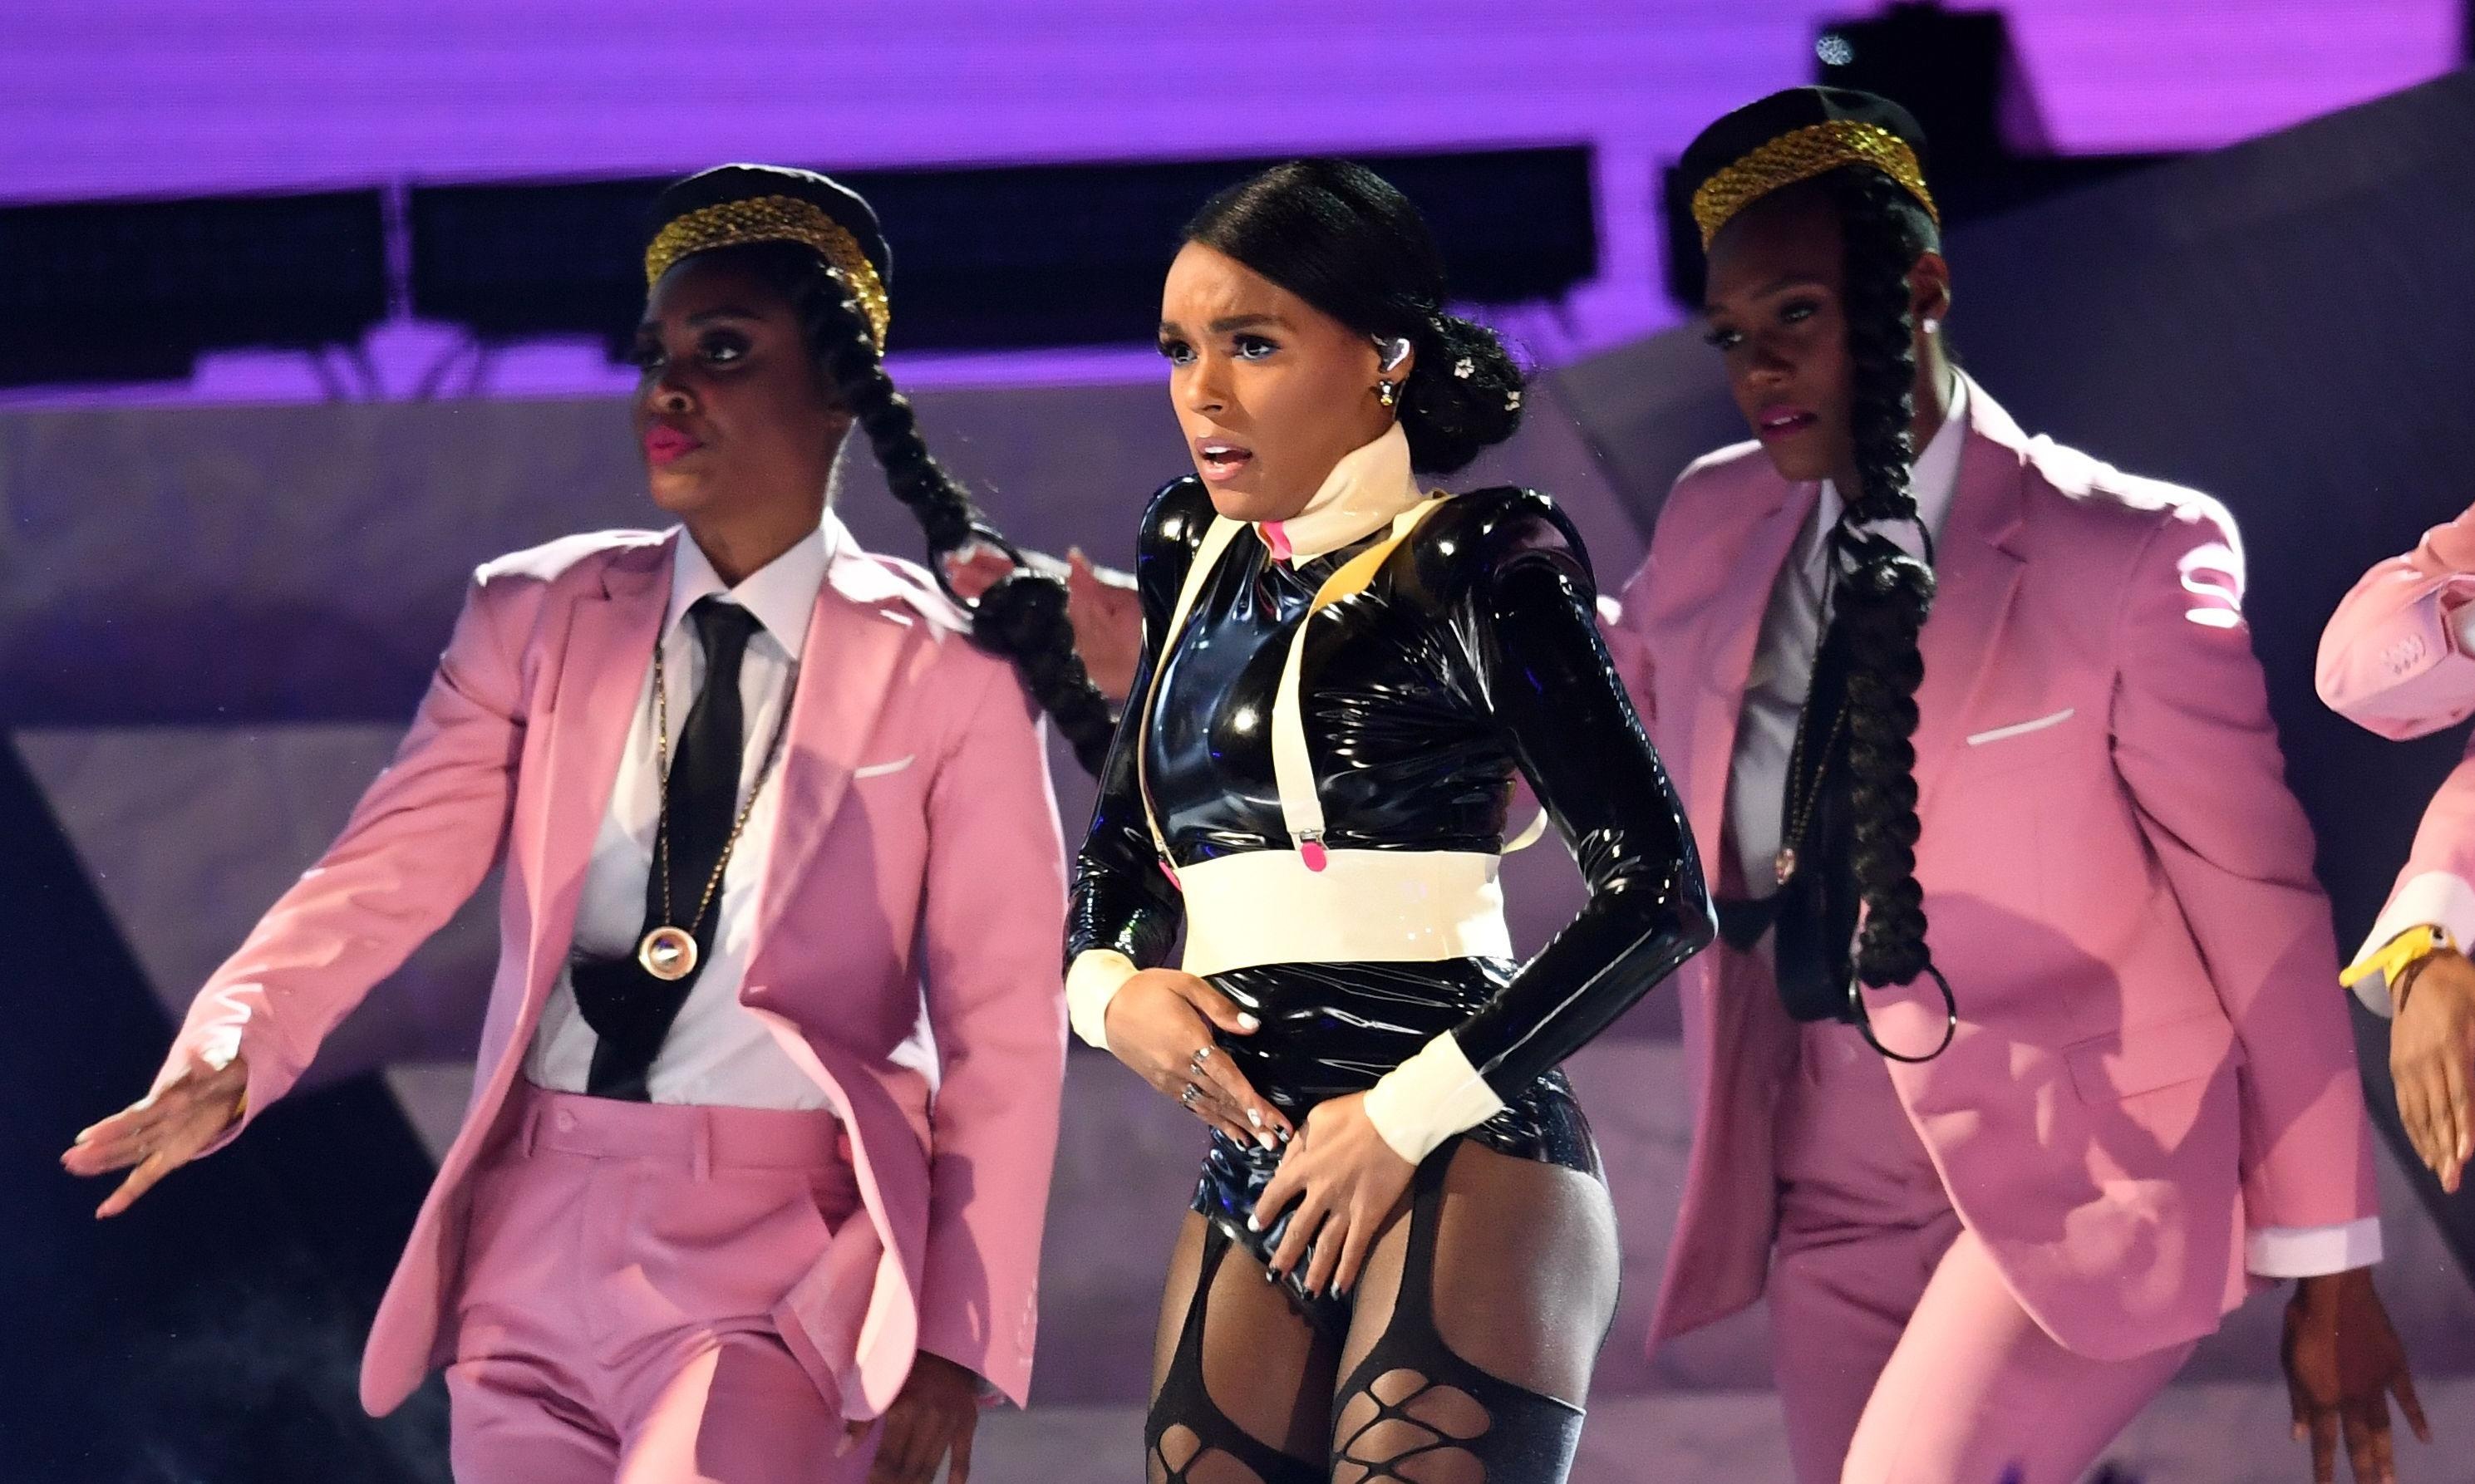 Fashion designer accuses Janelle Monáe of plagiarism for Grammy performance